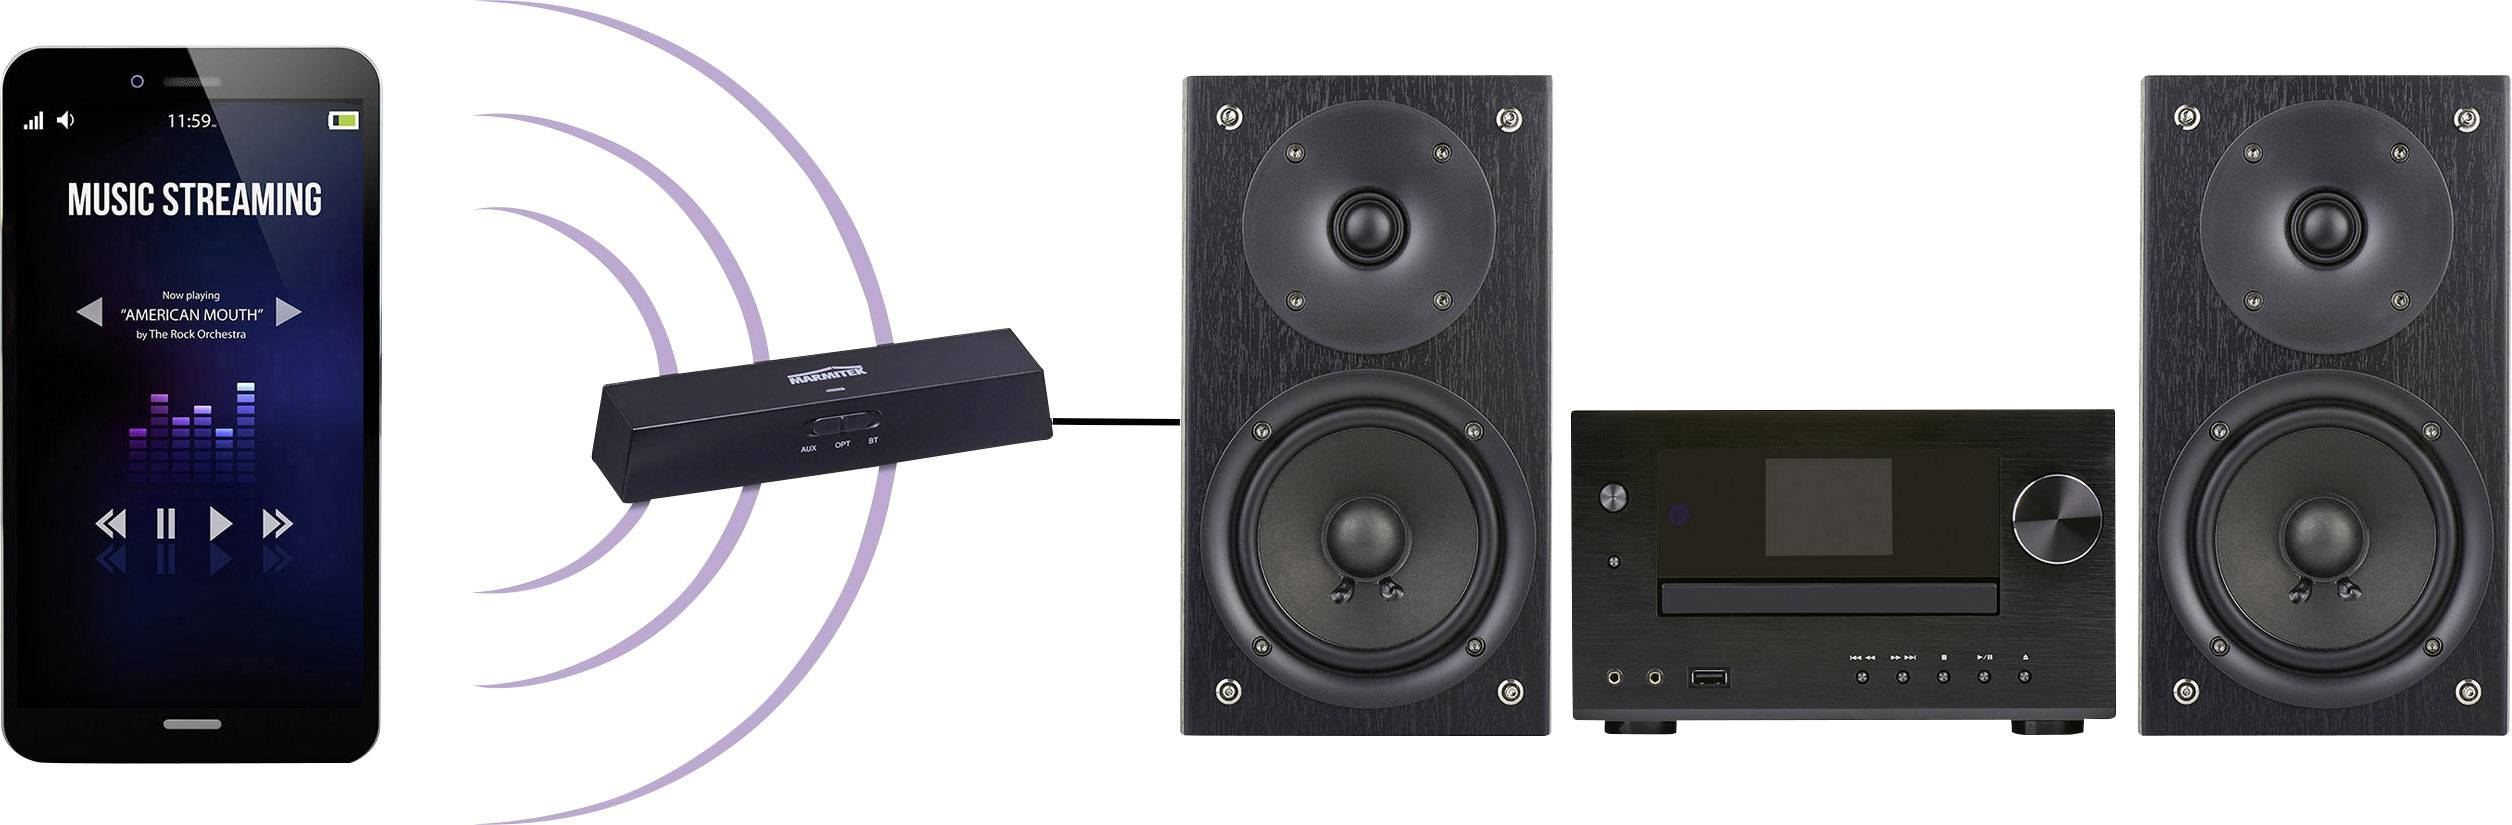 Marmitek BoomBoom 100 Bluetooth® sprejemnik glasbe (komplet) Bluetooth: 4.1 15 m aptx-tehnologija